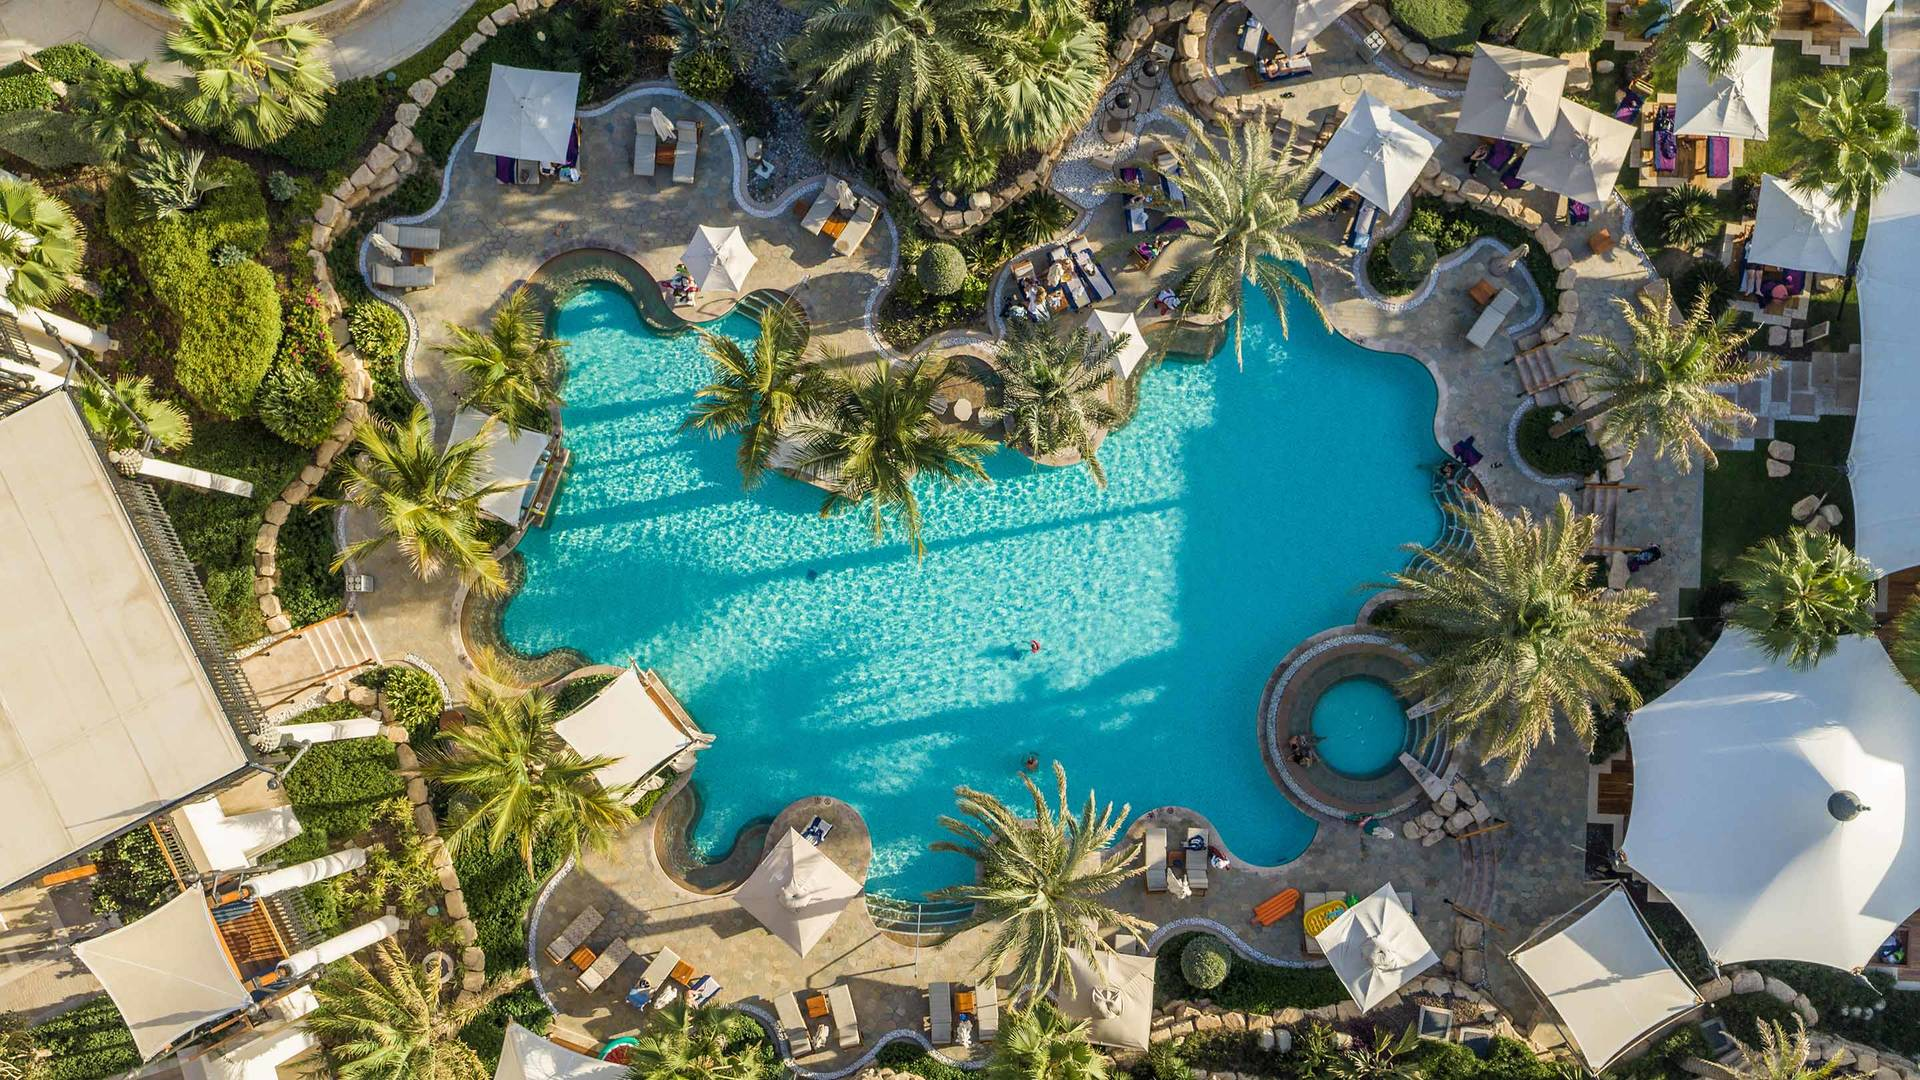 Jumeirah swimming pools Al Naseem_16-9